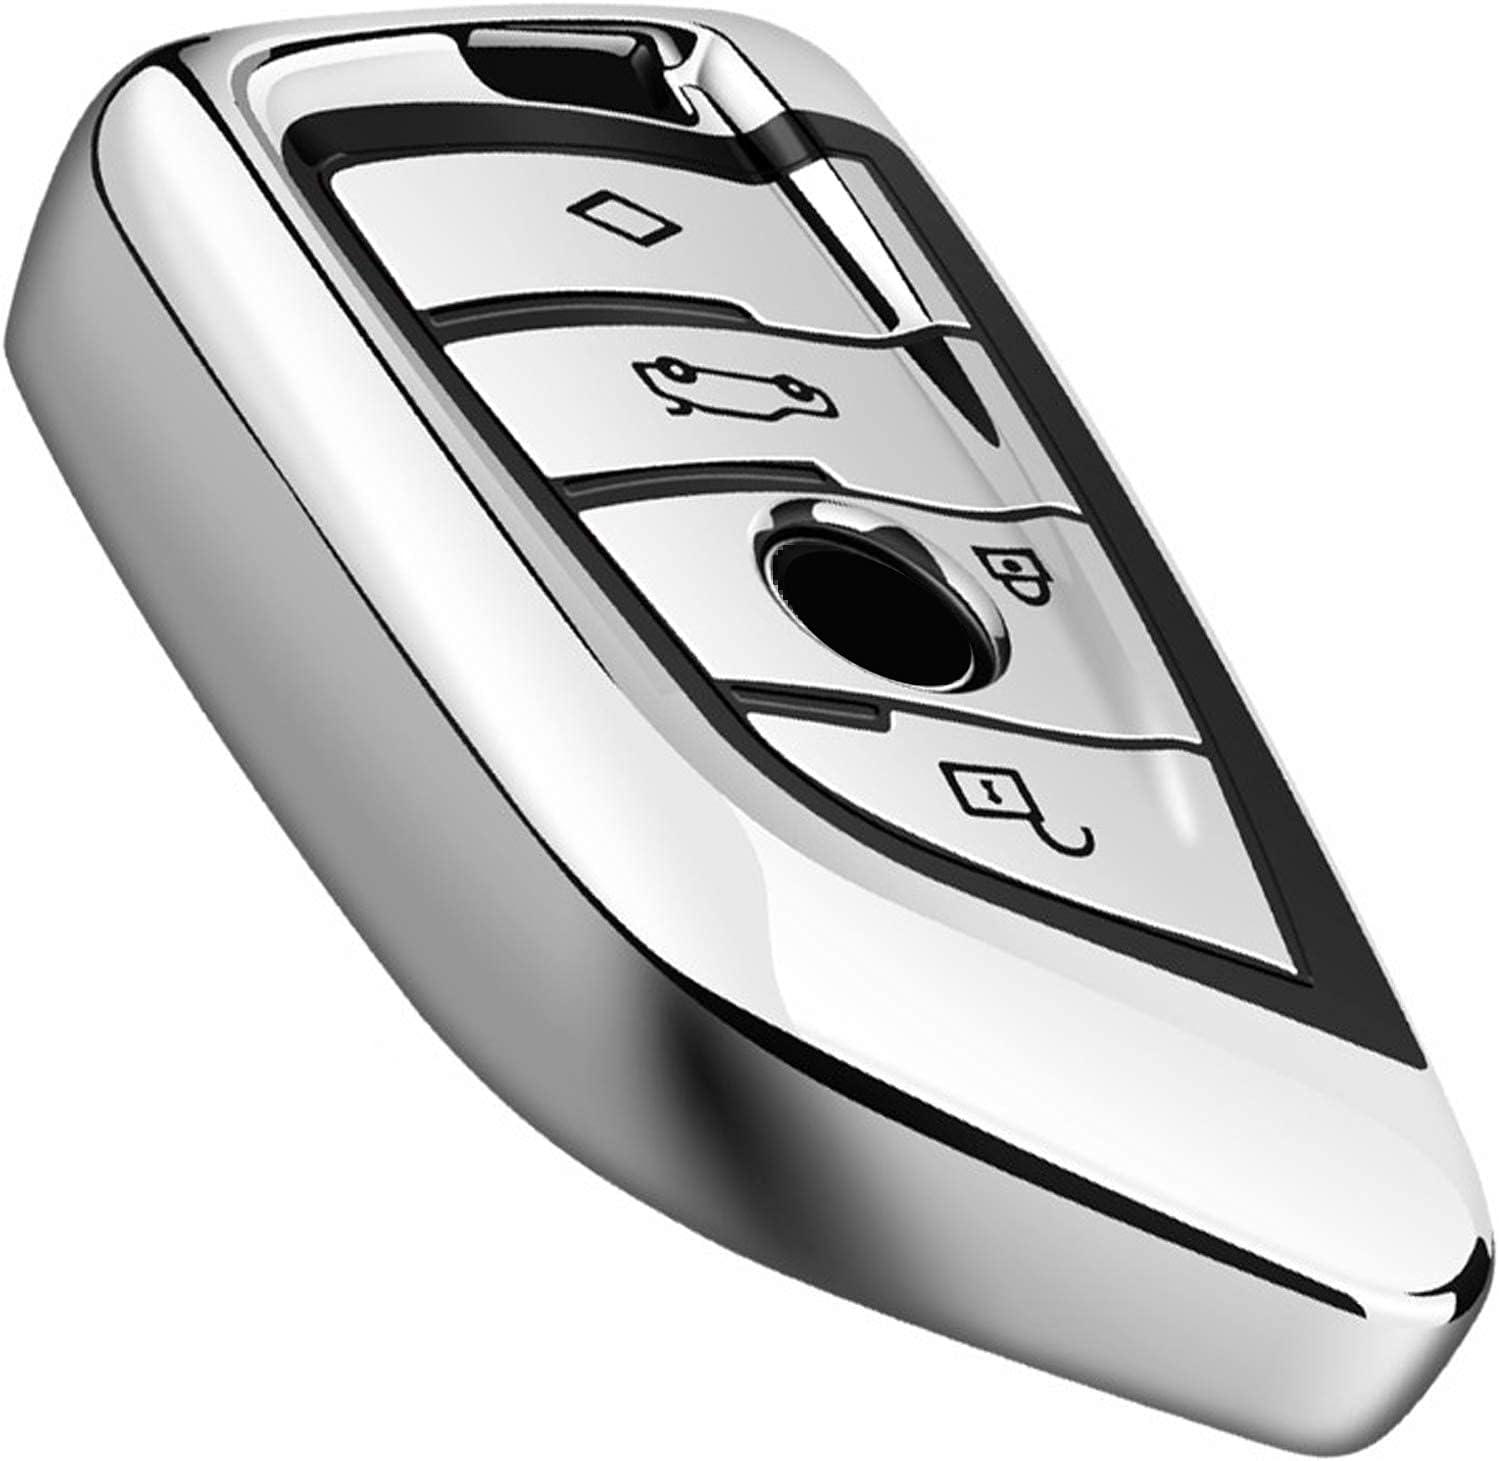 Intermerge for BMW Key Fob Cover S Case TPU Soft Max 76% Arlington Mall OFF Blade Shape